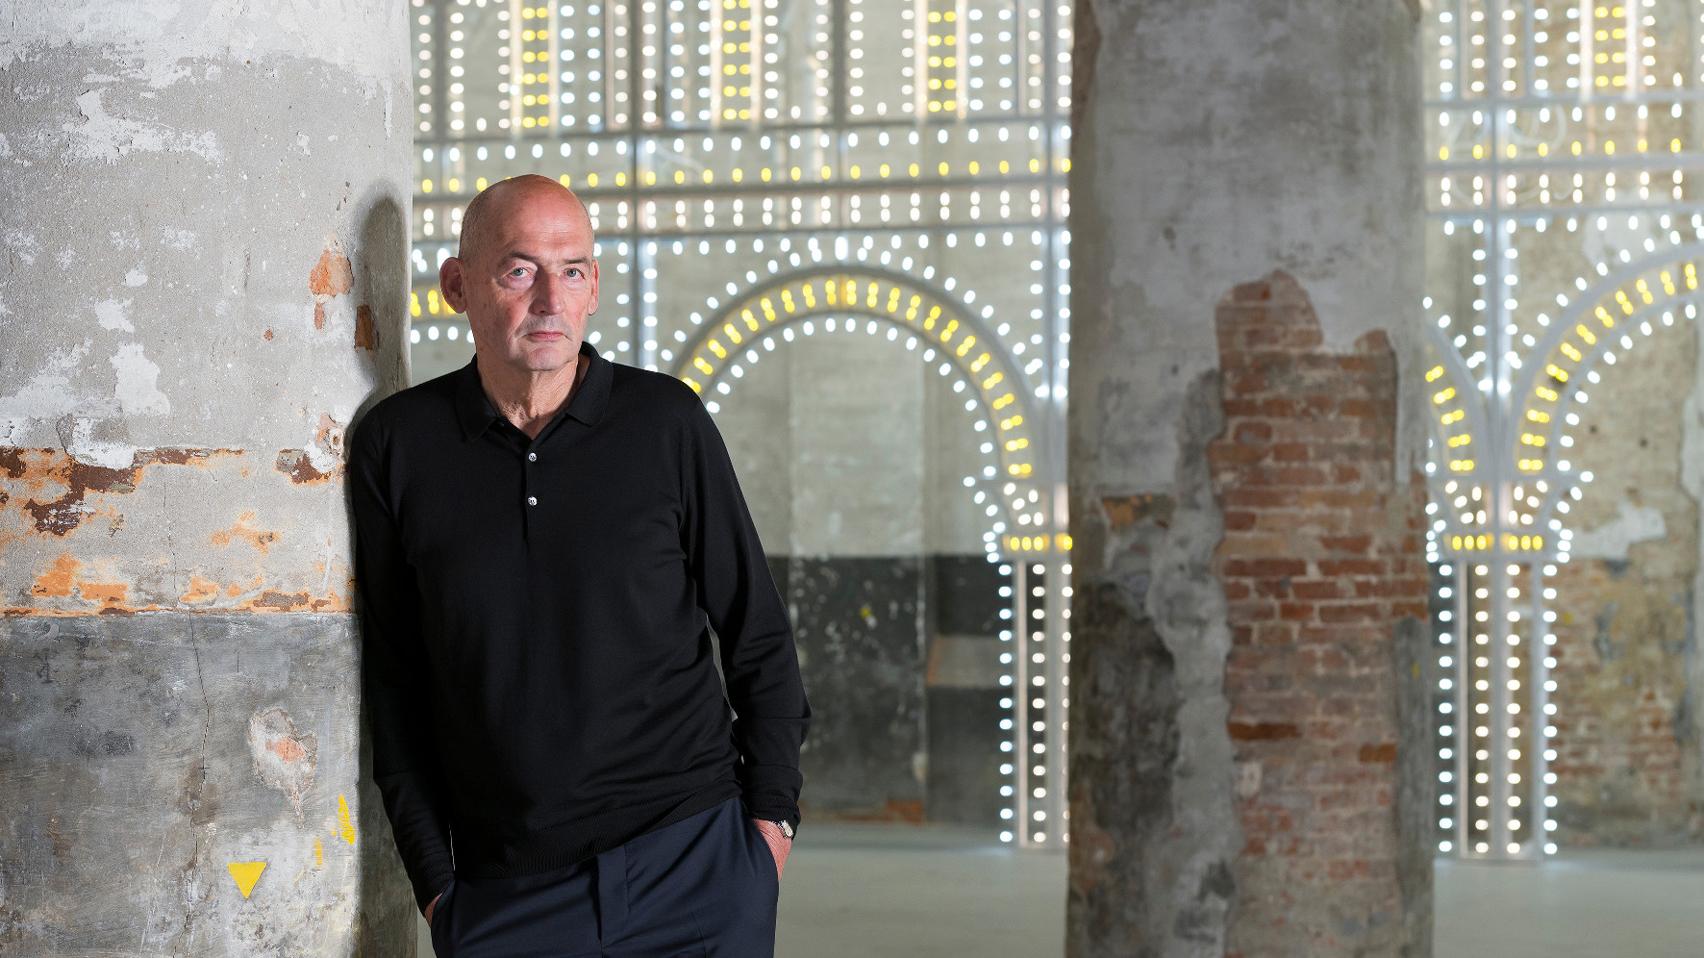 "Drastic change as a result of coronavirus is ""wishful thinking"" says Rem Koolhaas"